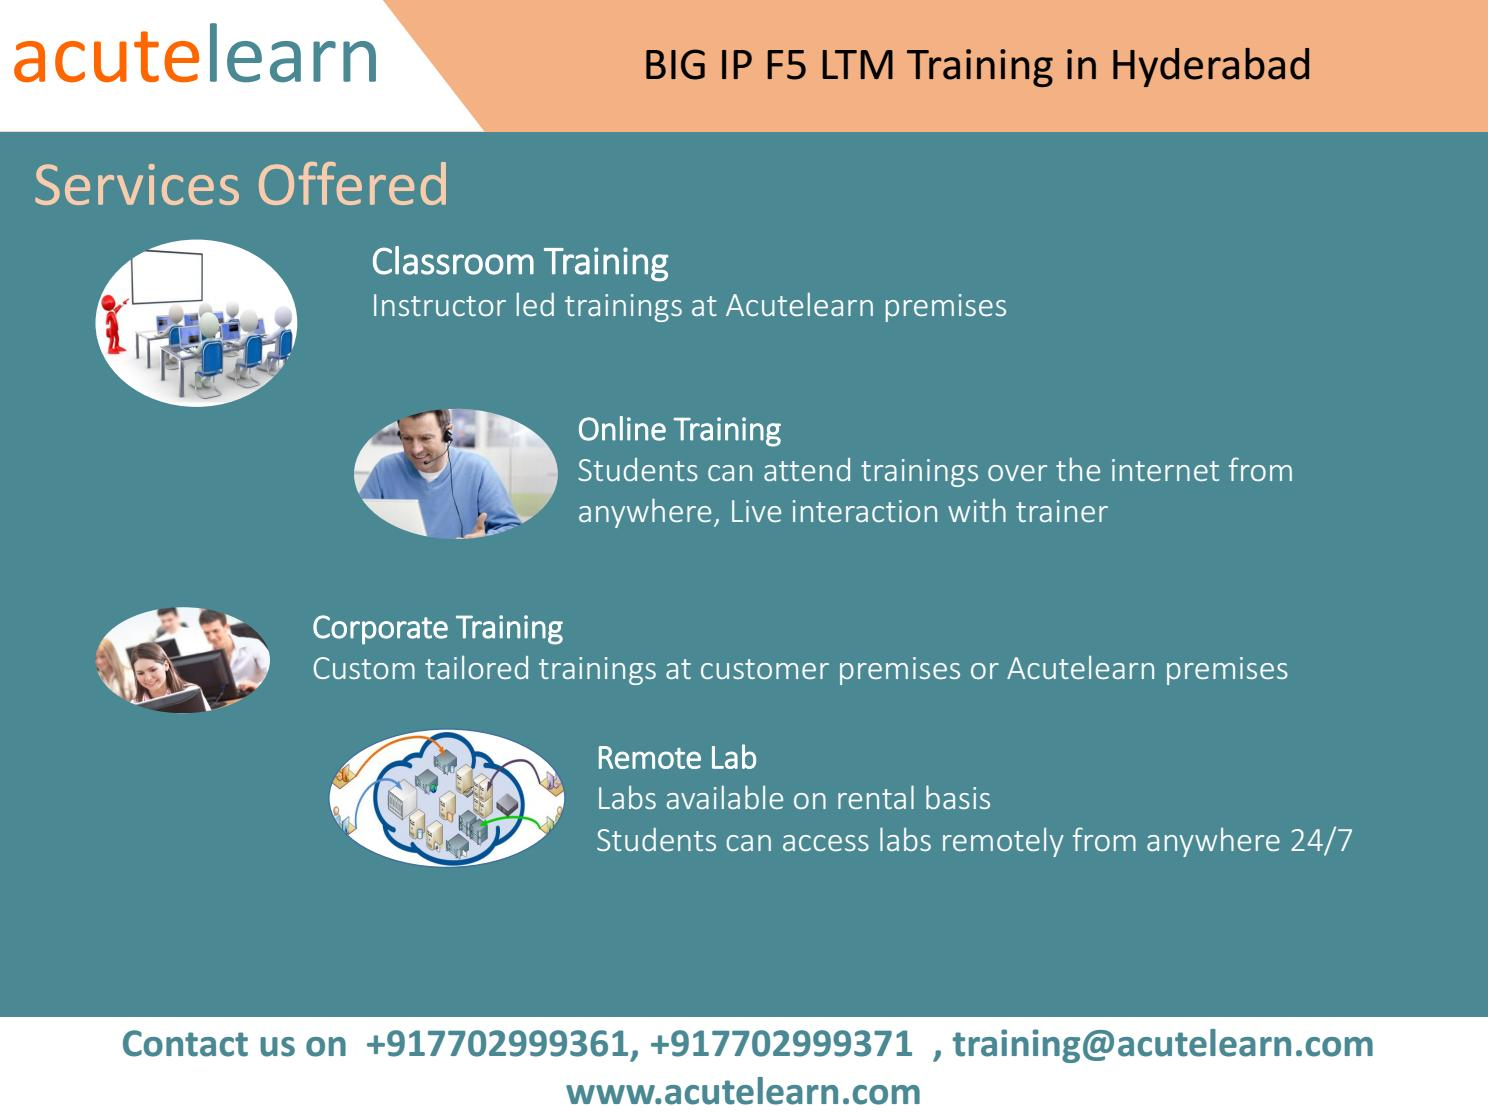 BIG IP F5 LTM Training | BIG IP F5 LTM Training in Hyderabad